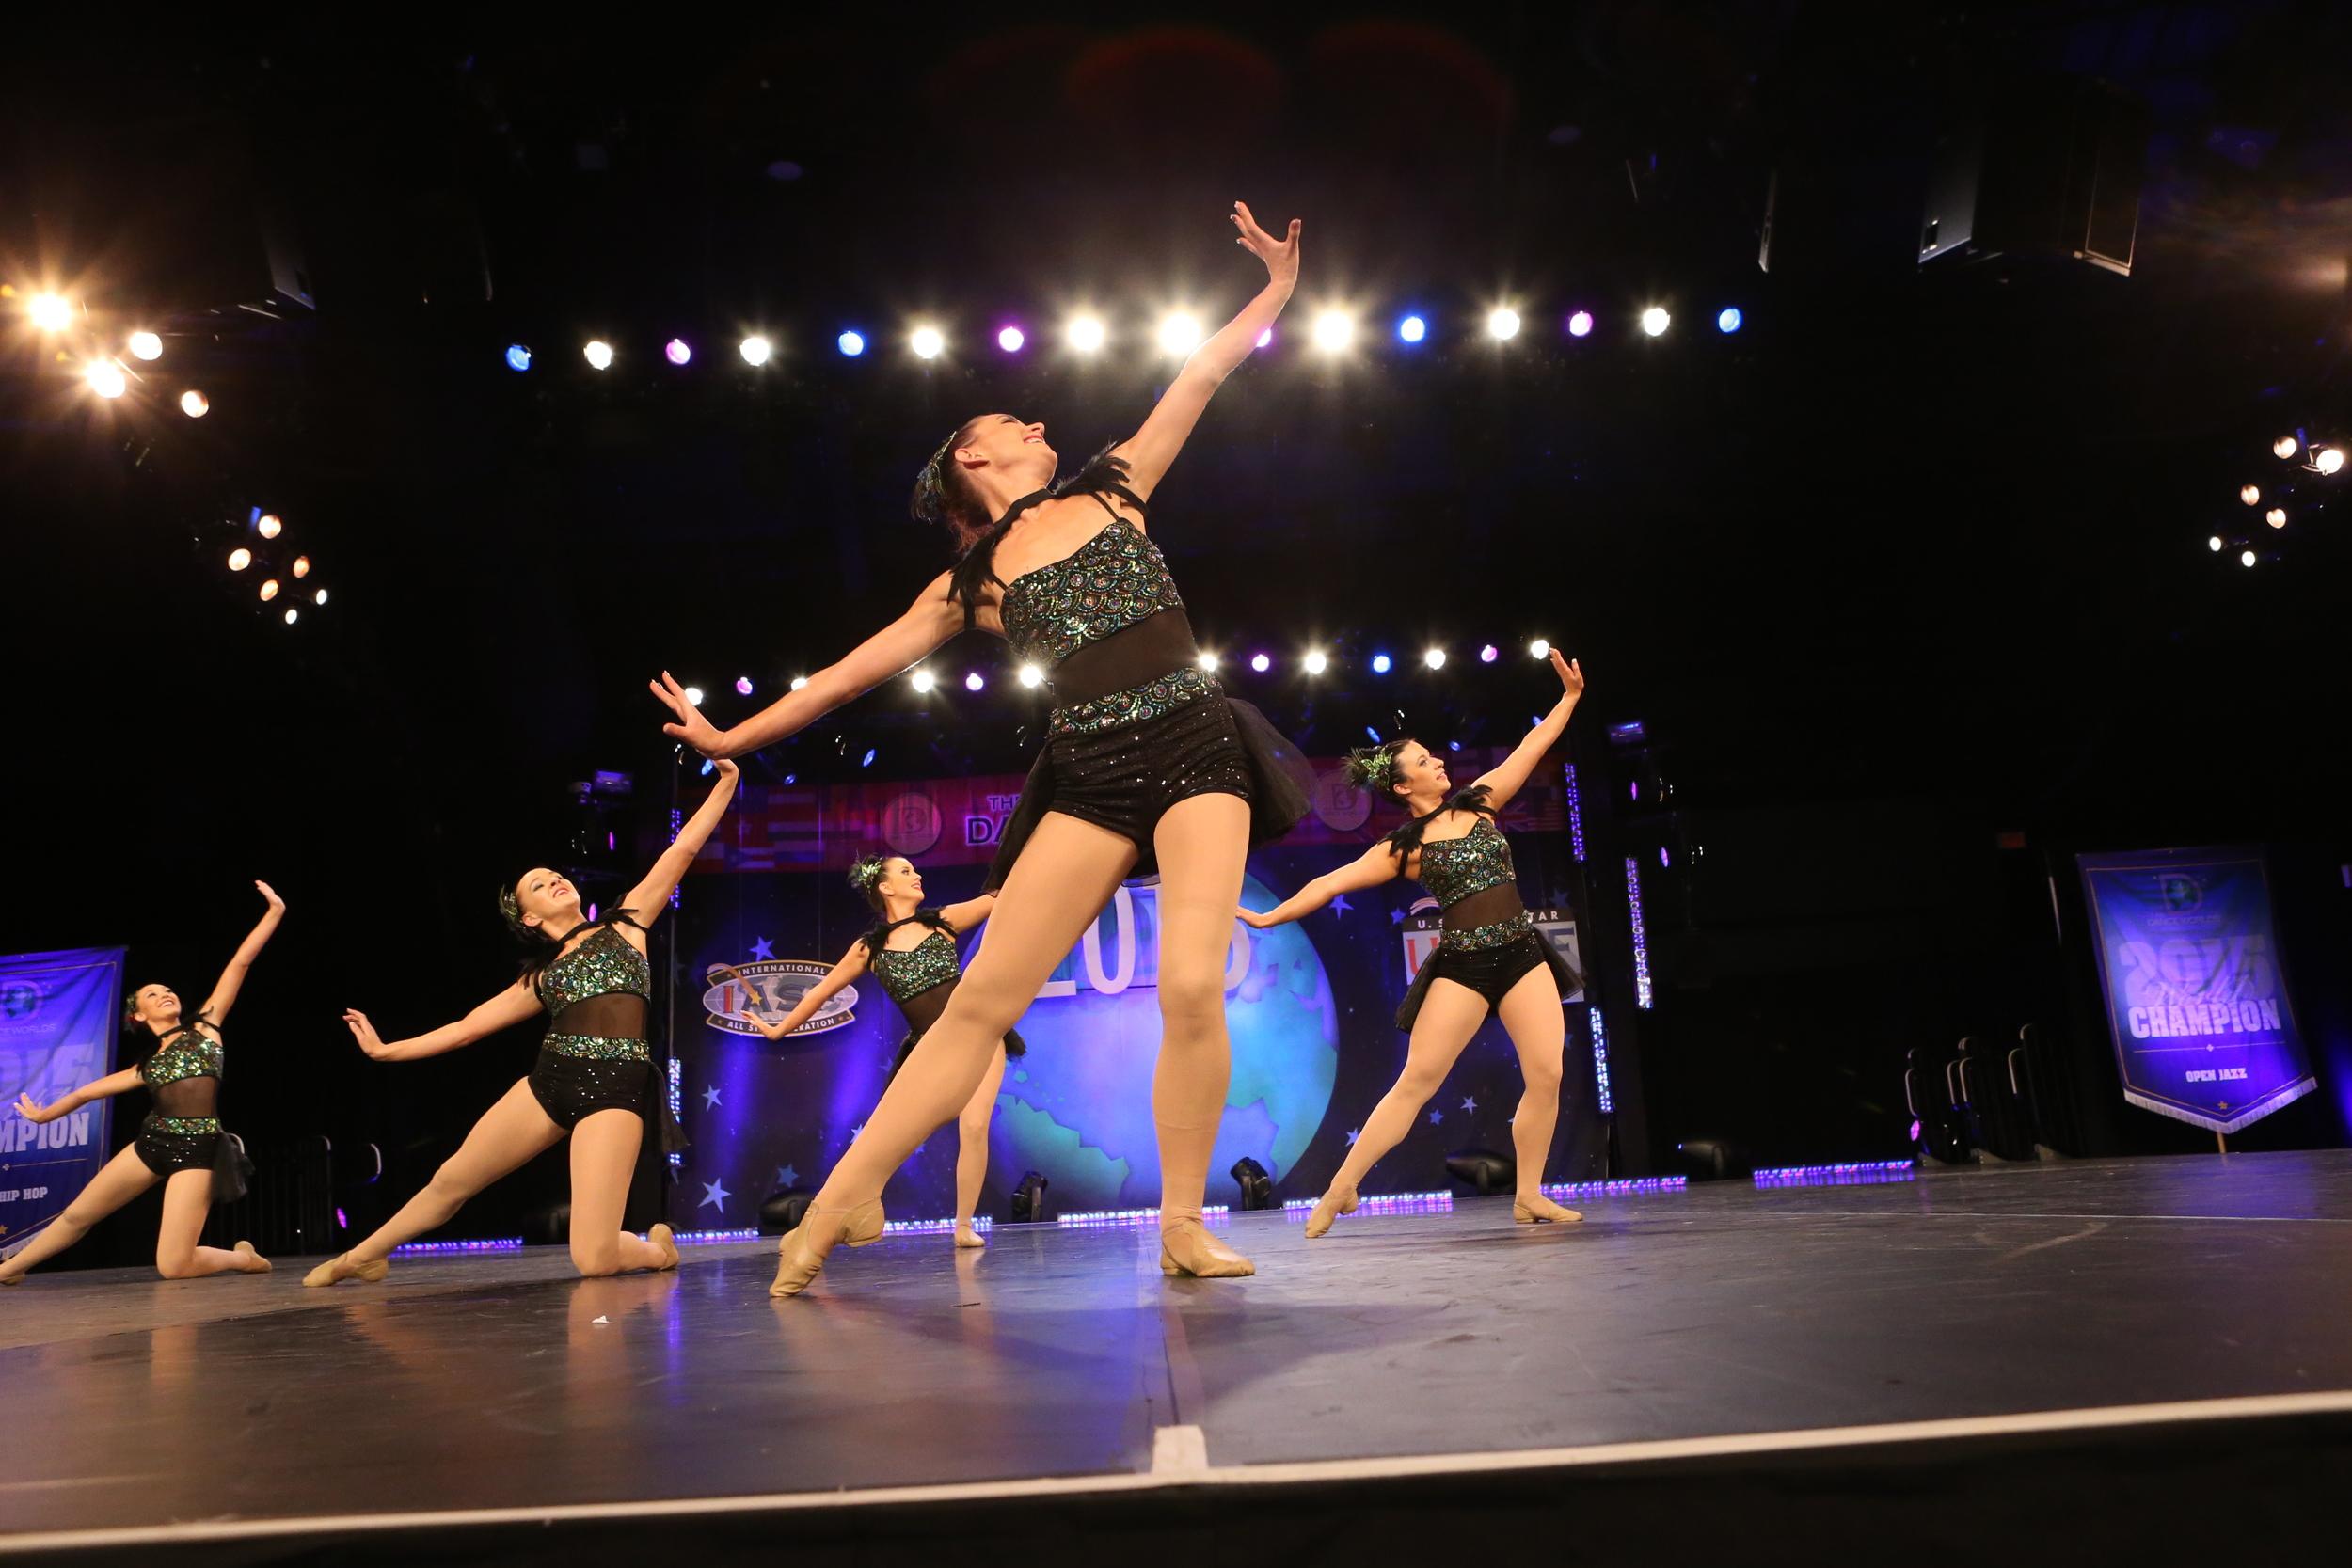 Dance World Championships USASF Mathis Dance Studios Melbourne Australia